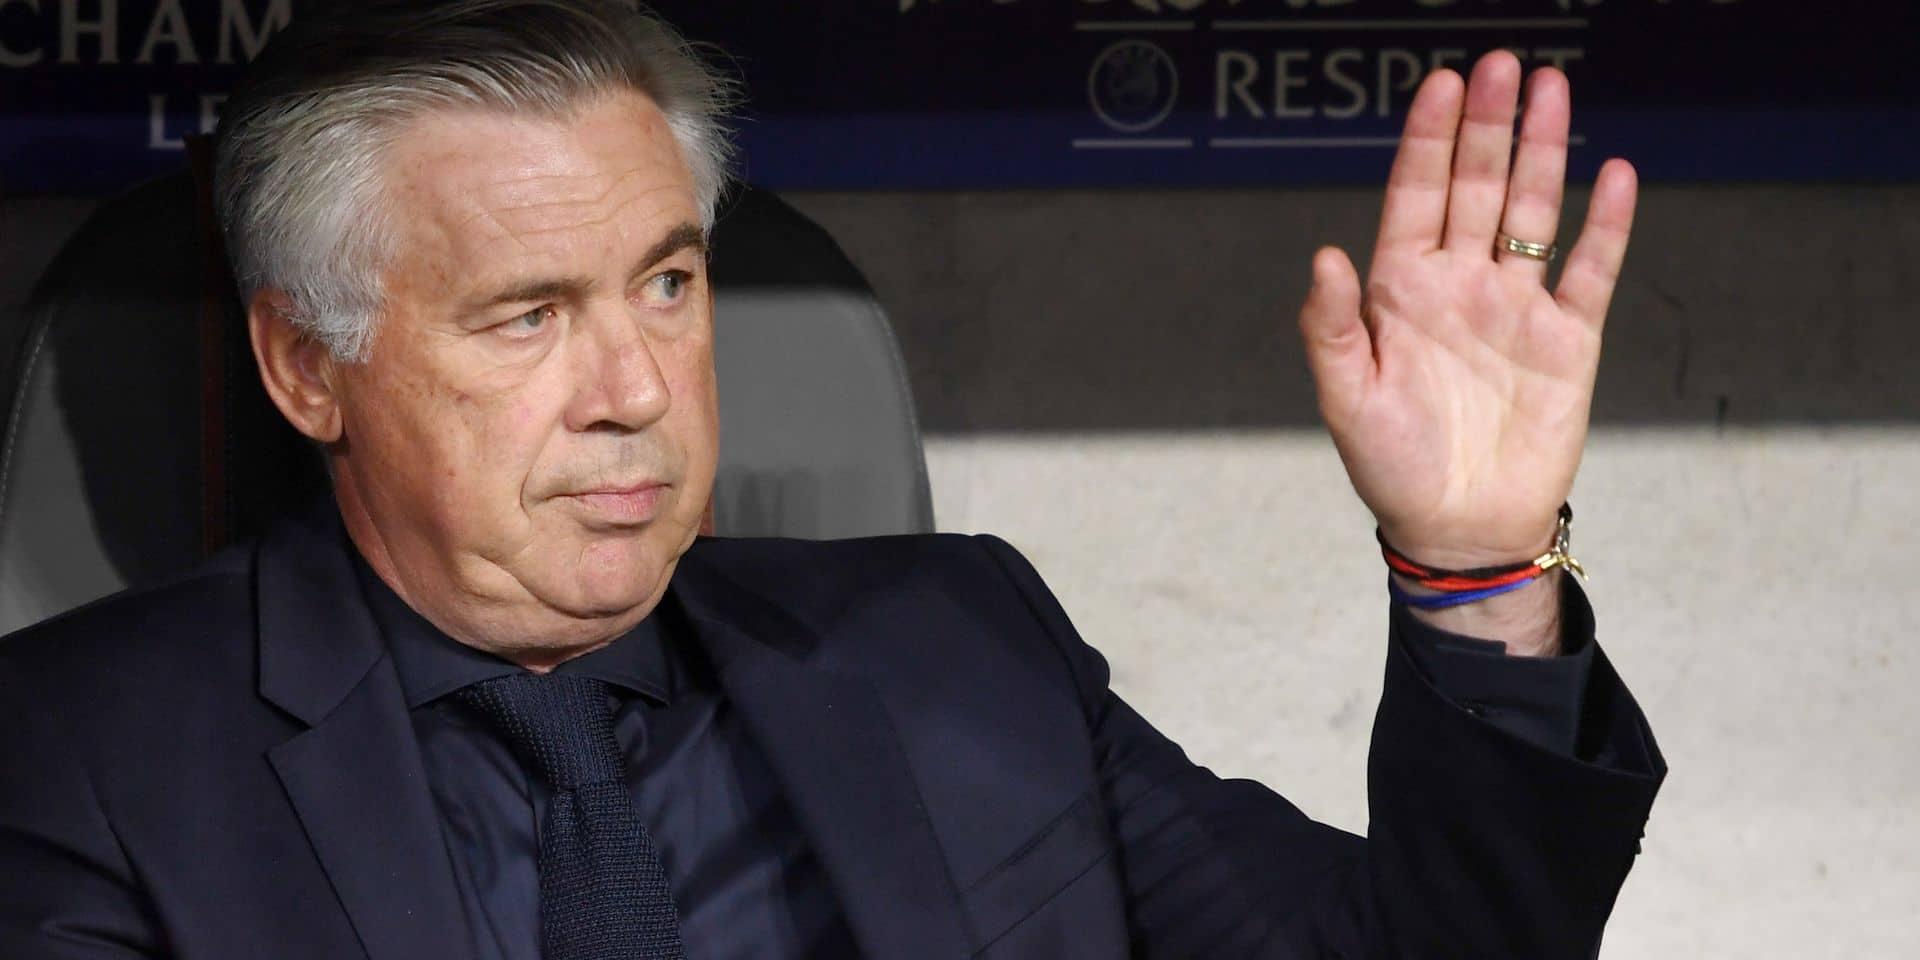 Carlo Ancelotti va rejoindre Naples